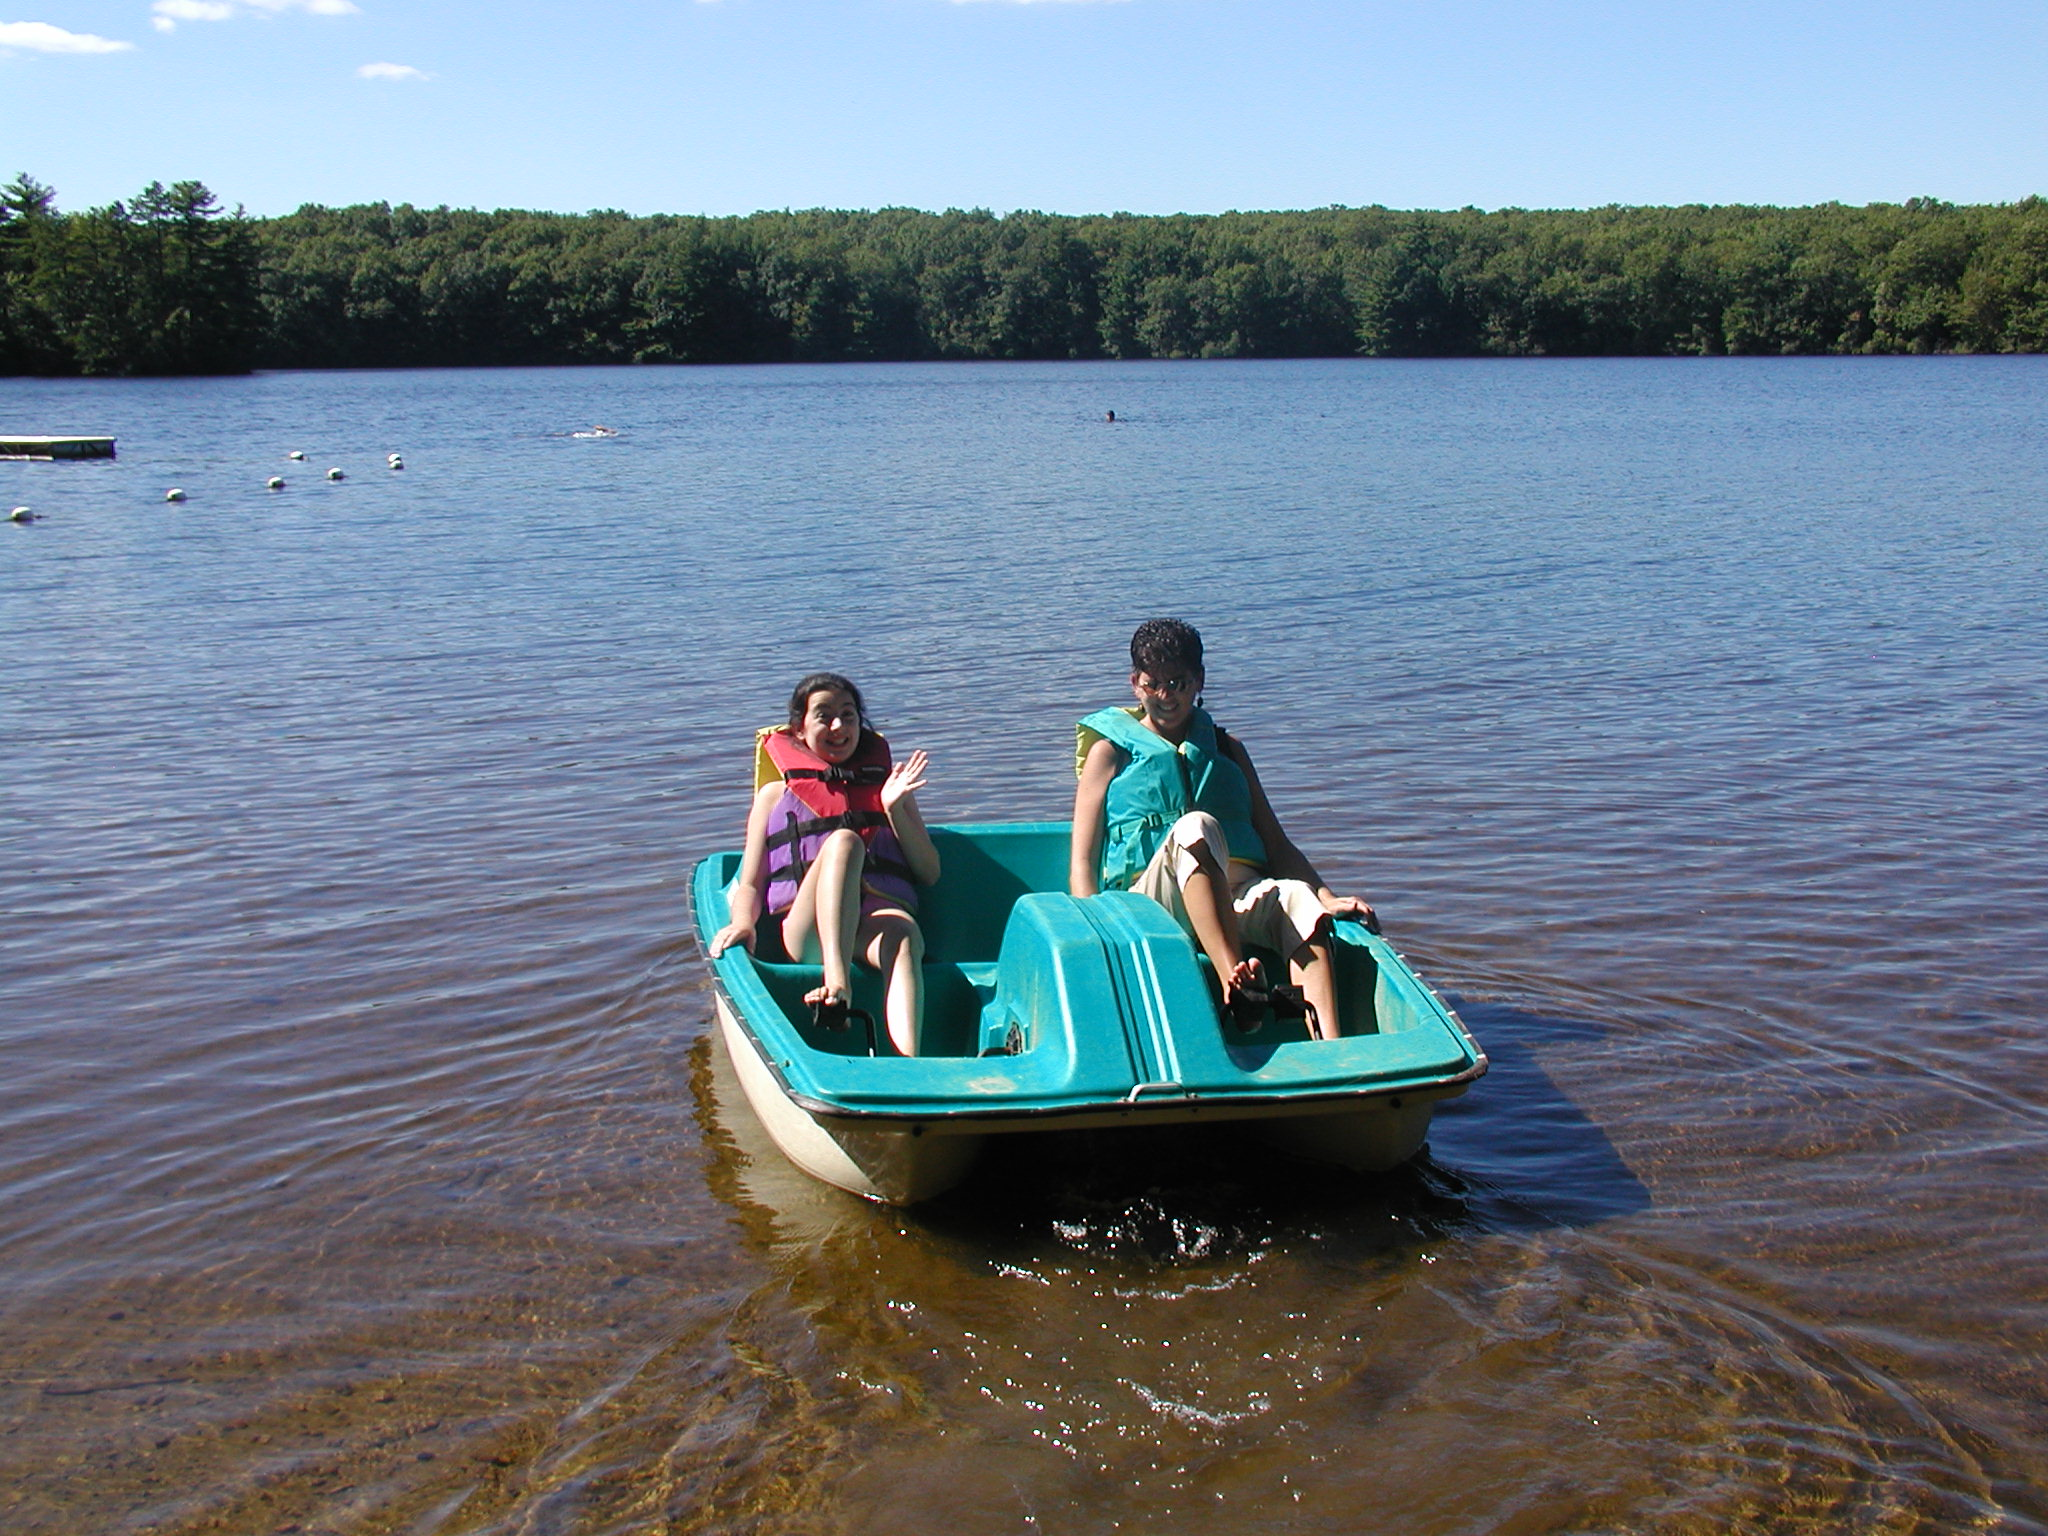 Ashland State Park A Massachusetts Park Located Near Acton Arlington And Ashland